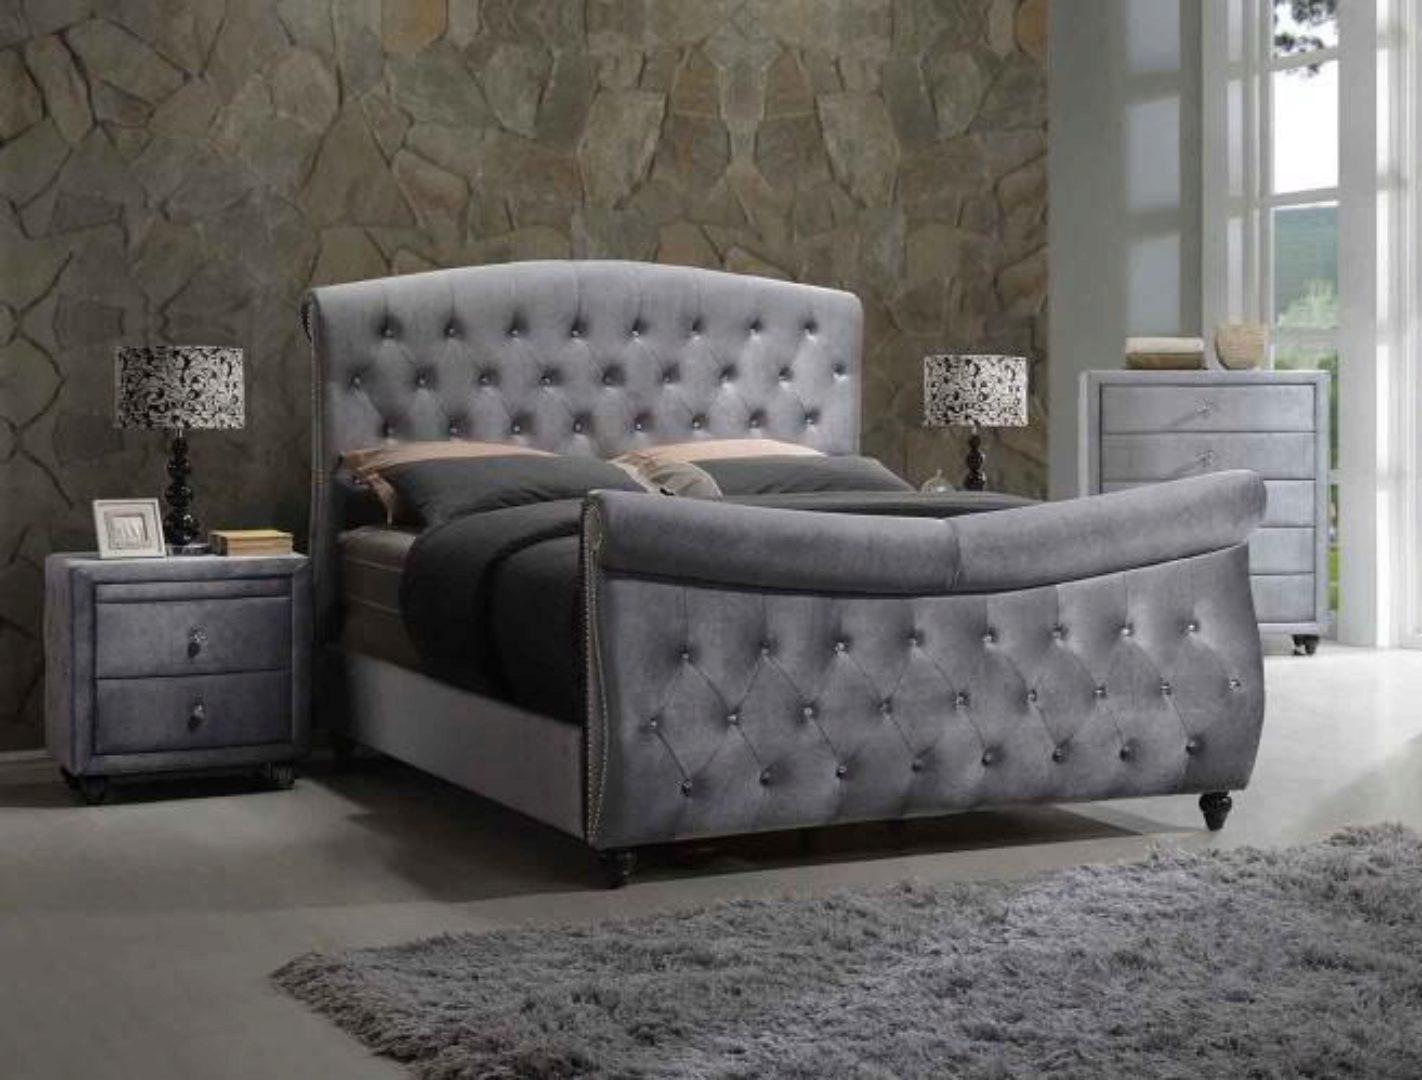 meridian hudson sleigh king size bedroom set 3pcs in gray